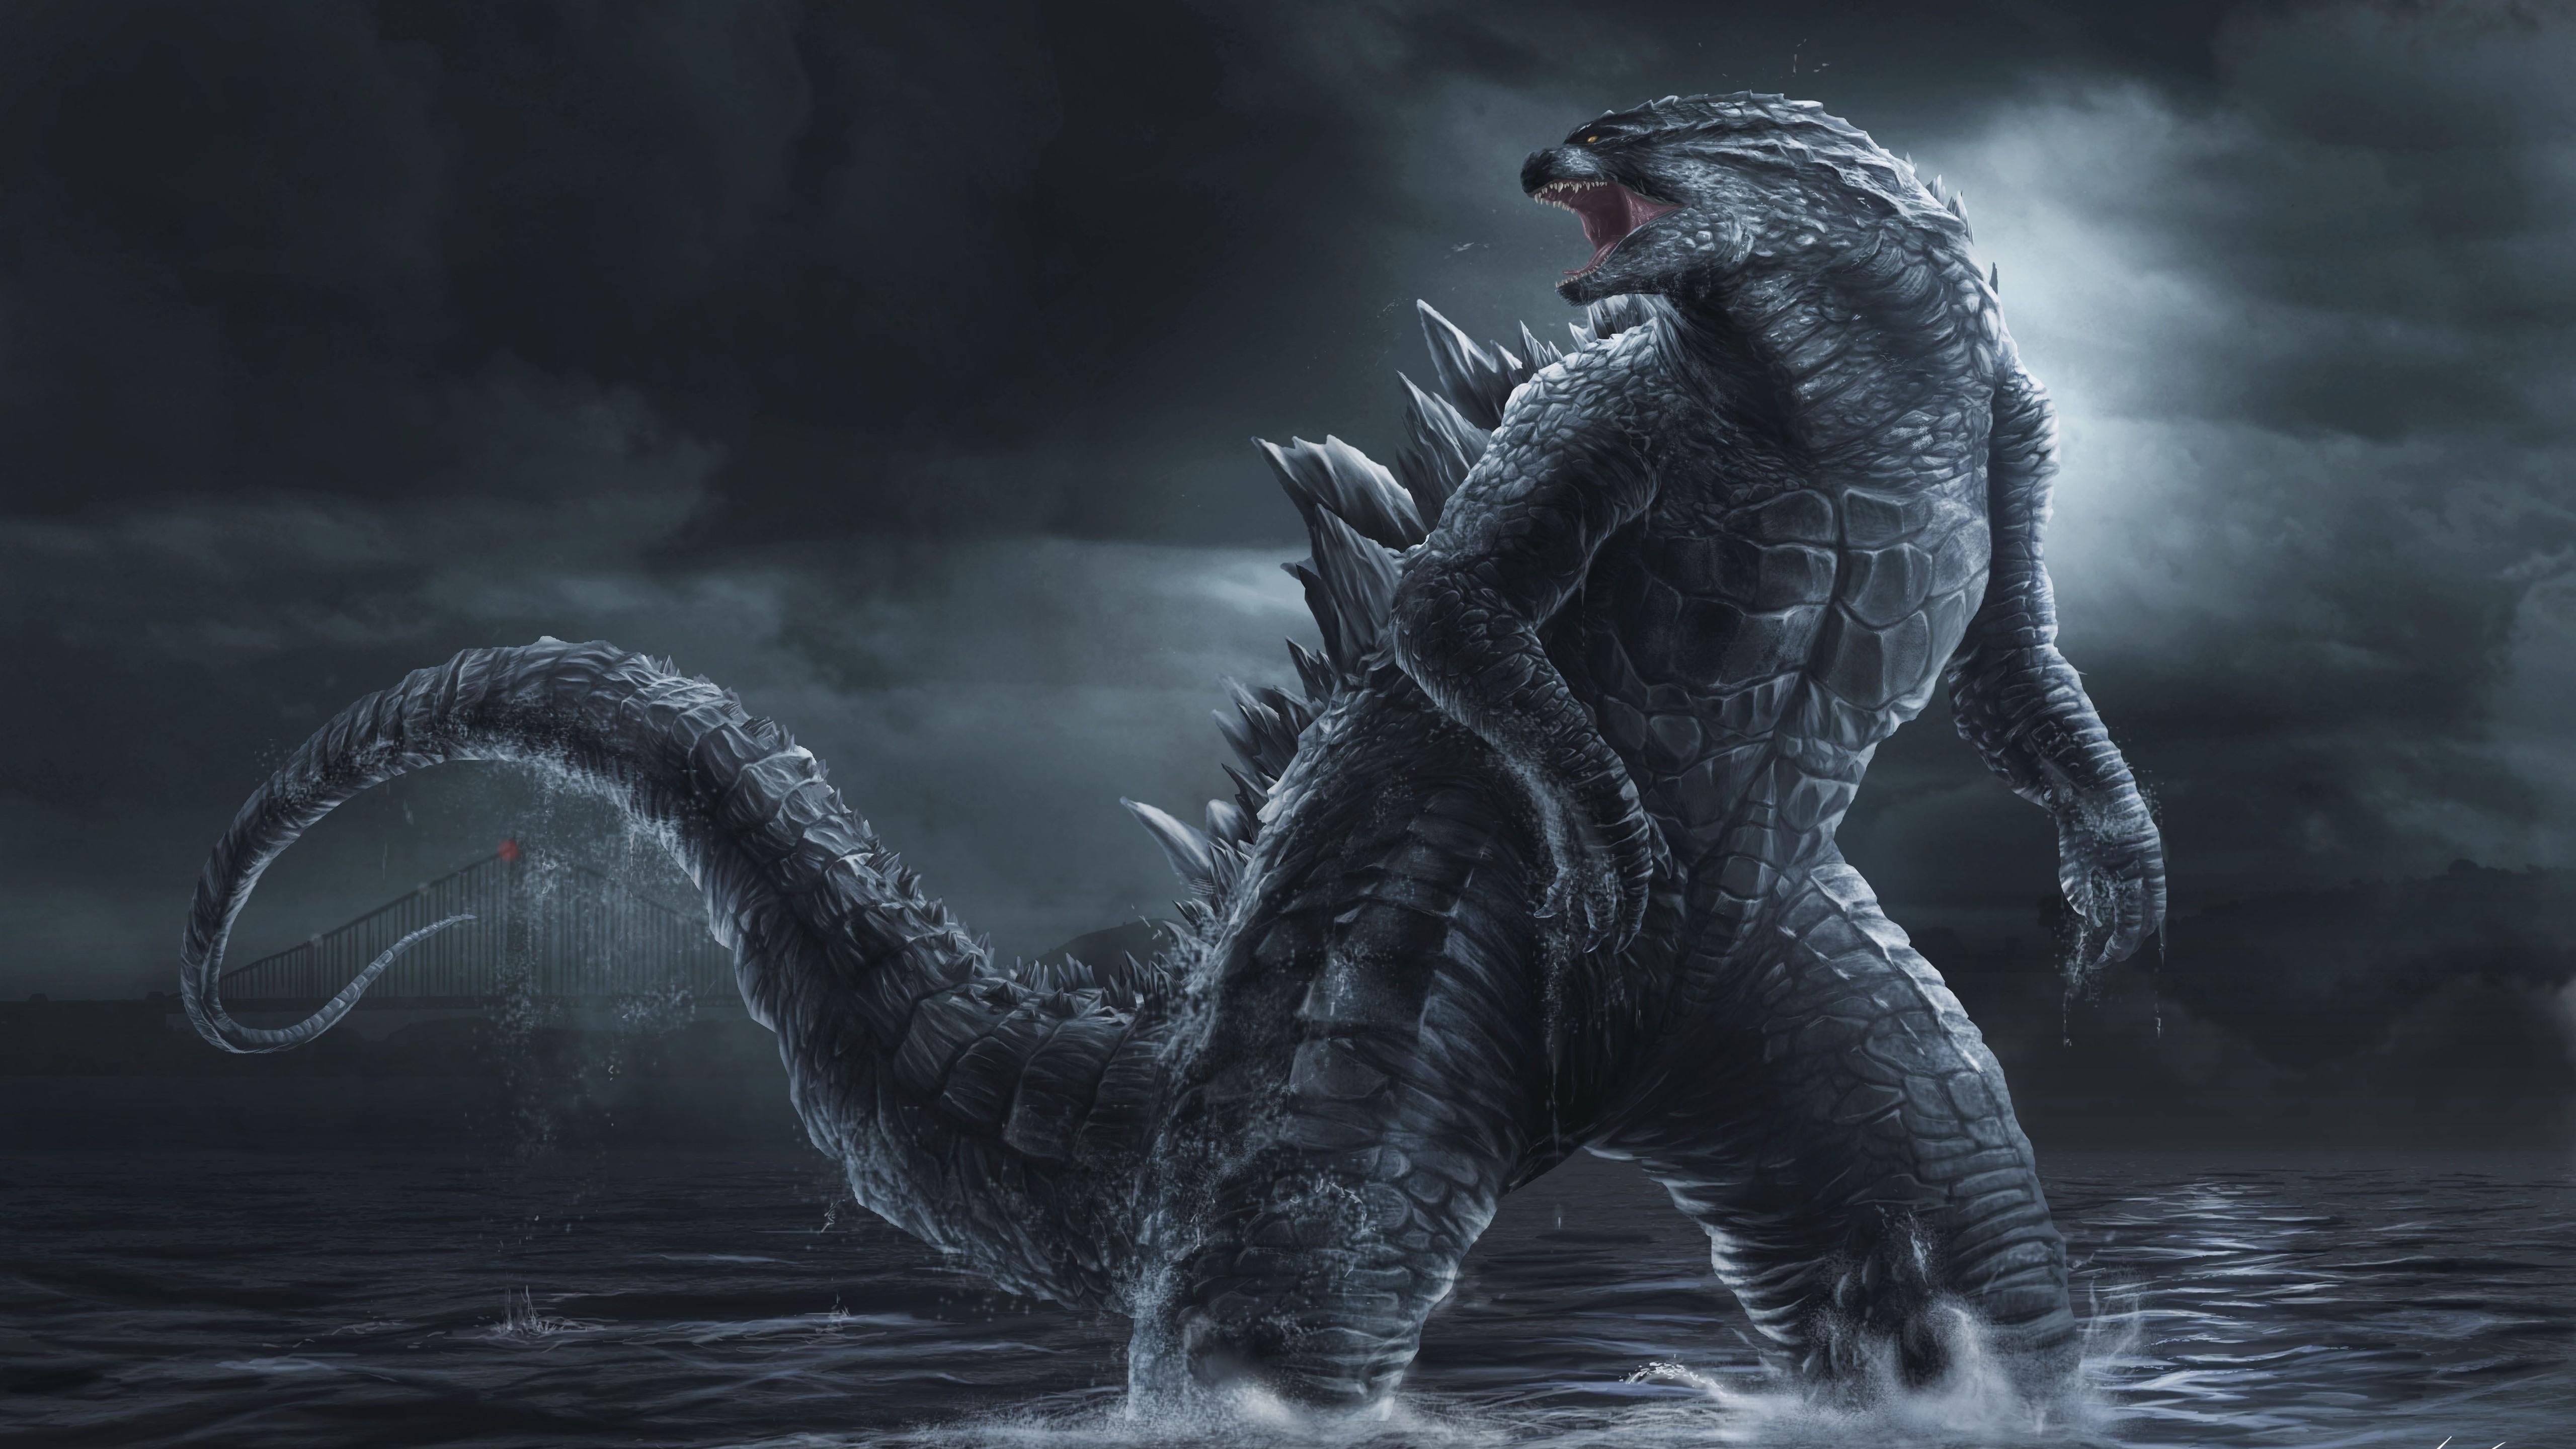 Wallpaper Godzilla Art Picture 5120x2880 Uhd 5k Picture Image